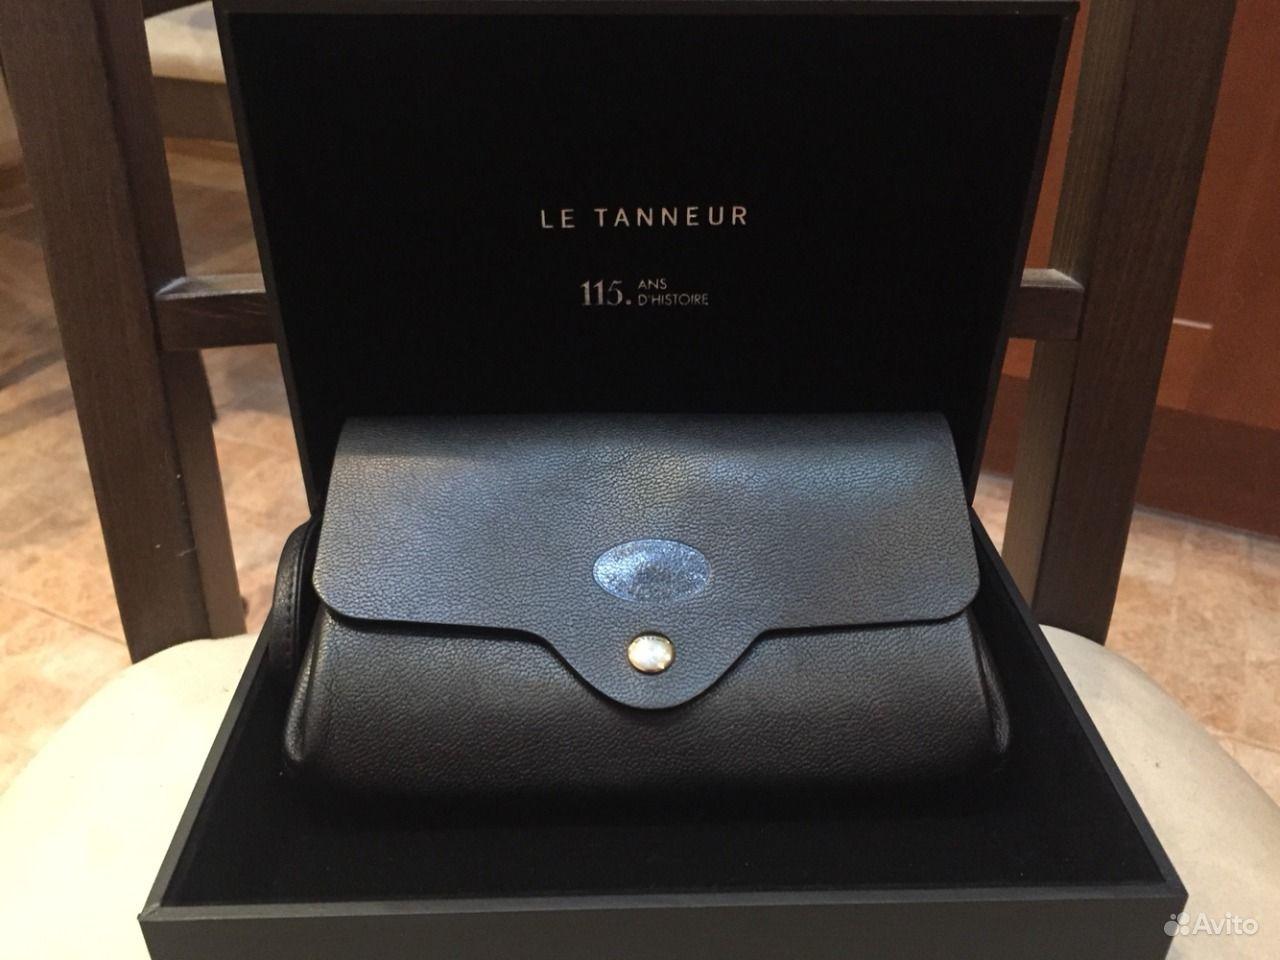 Женские сумки Le Tanneur, купить женскую сумку Le